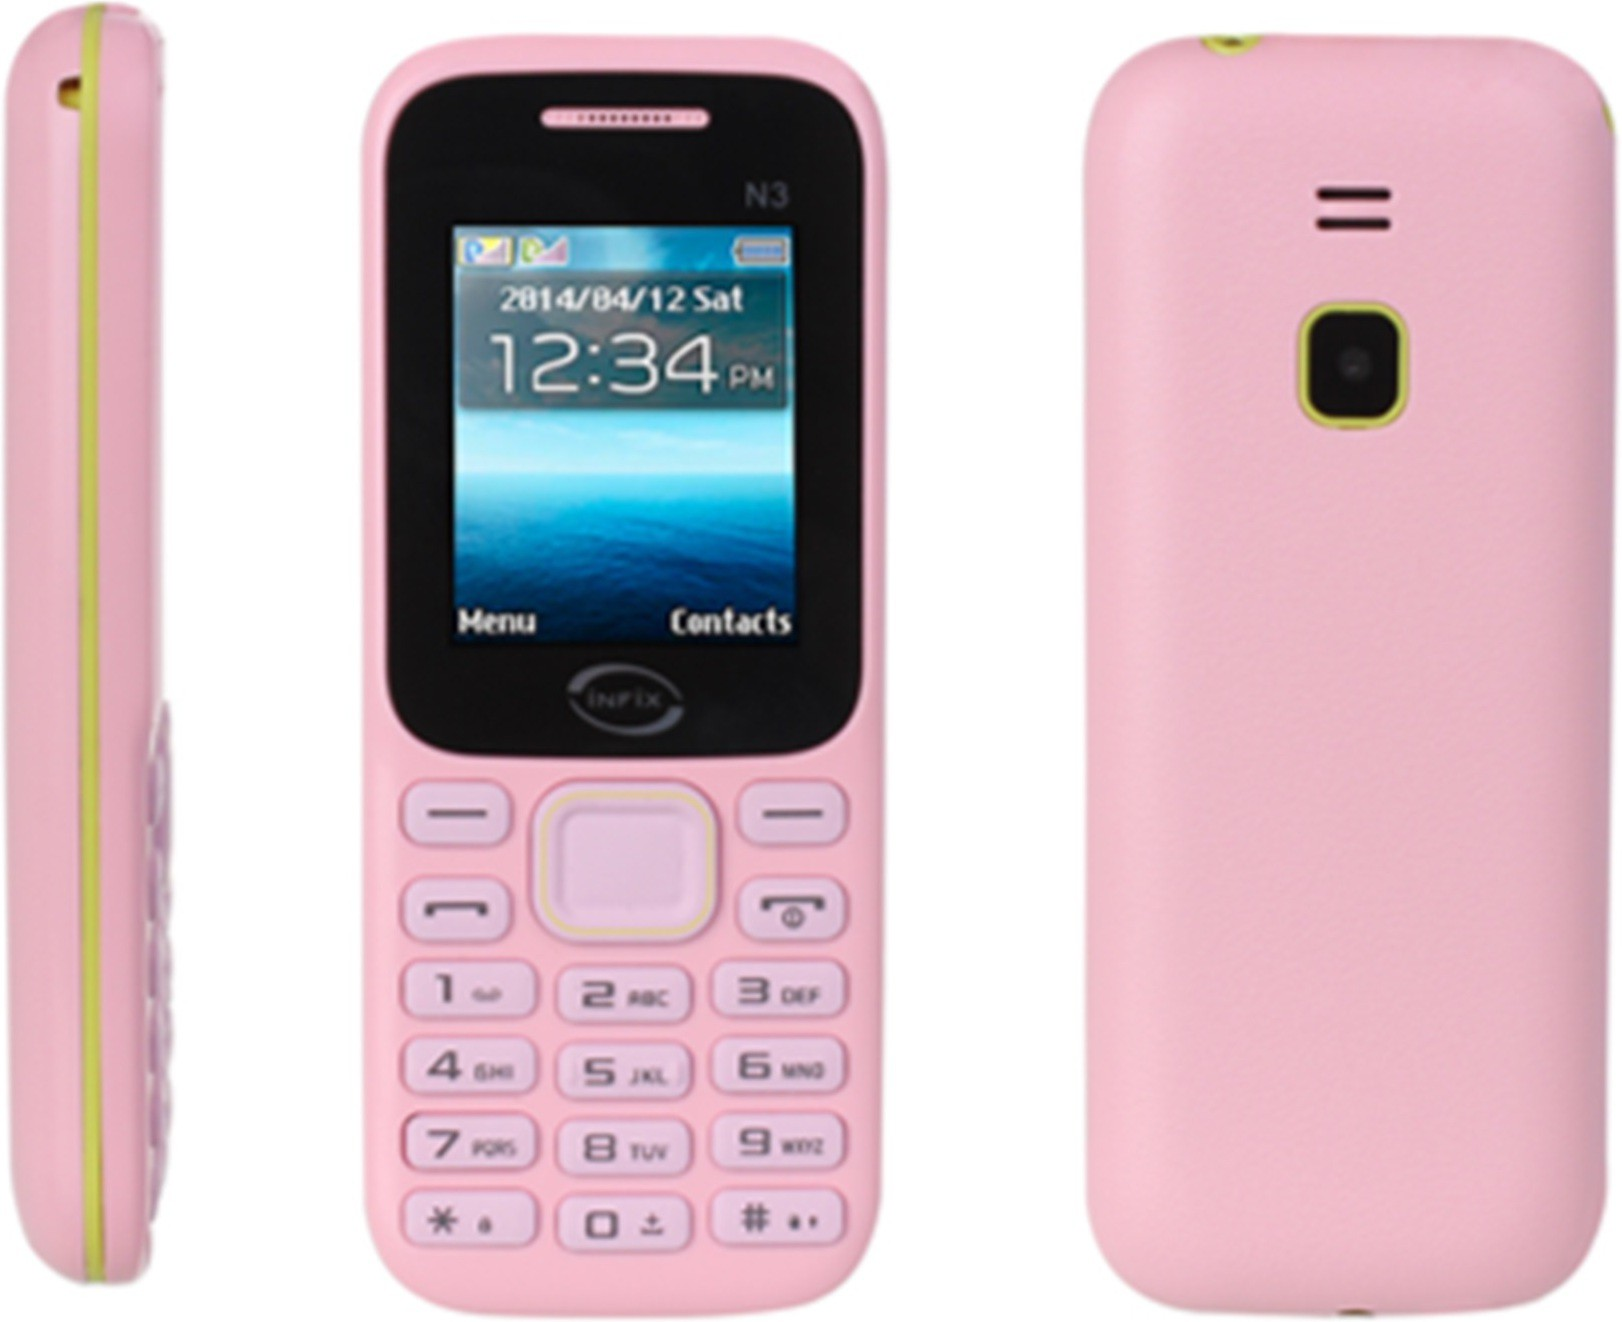 Infix N3(Pink)